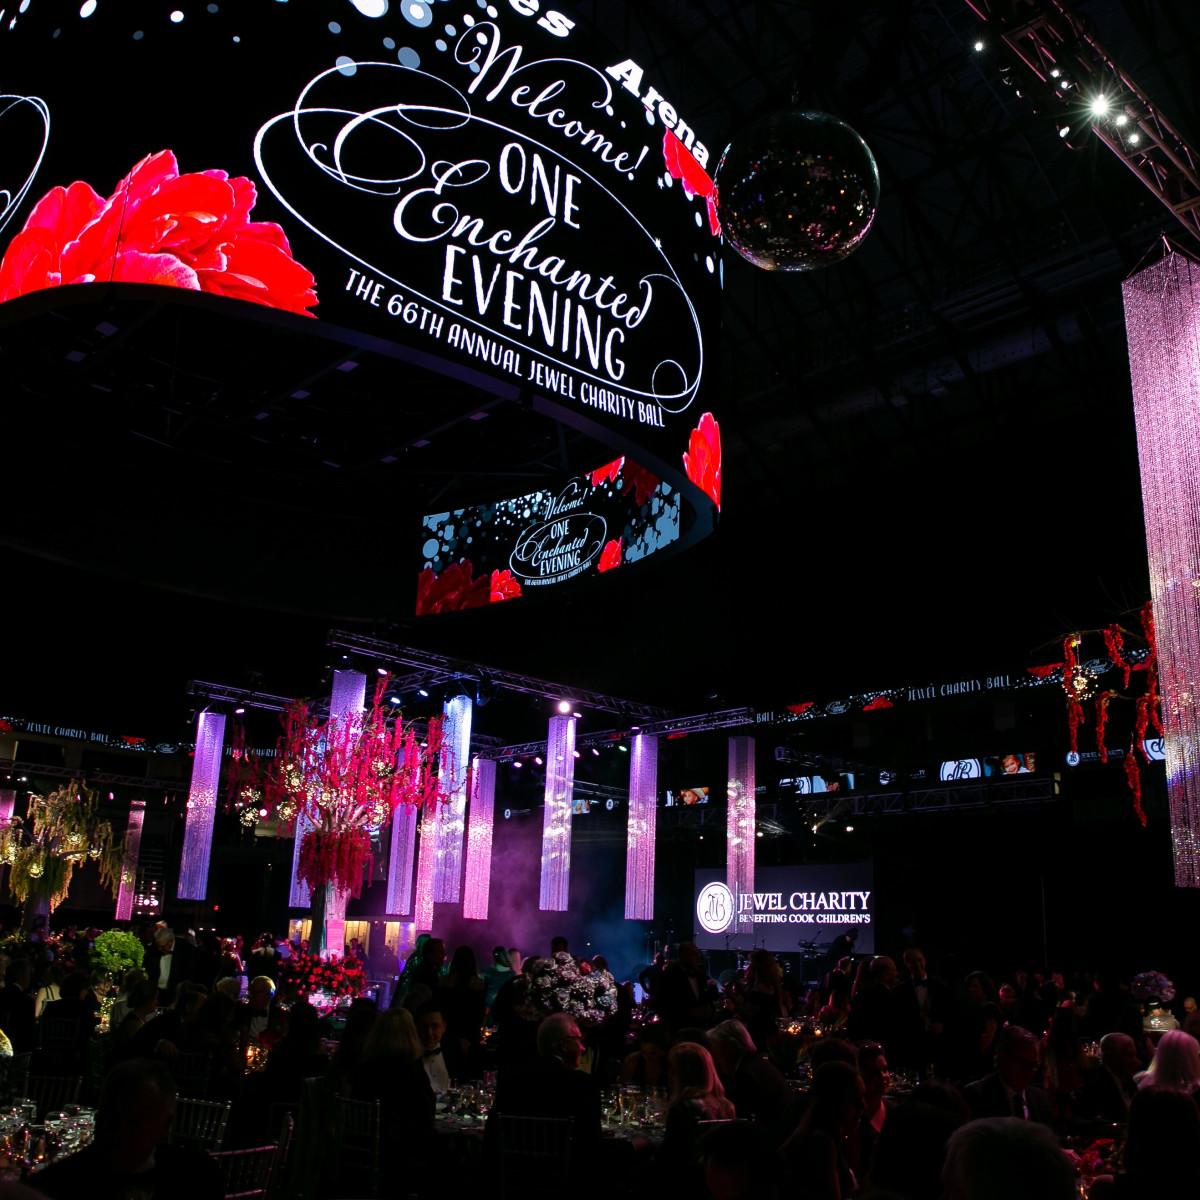 Jewel Charity Ball 2020